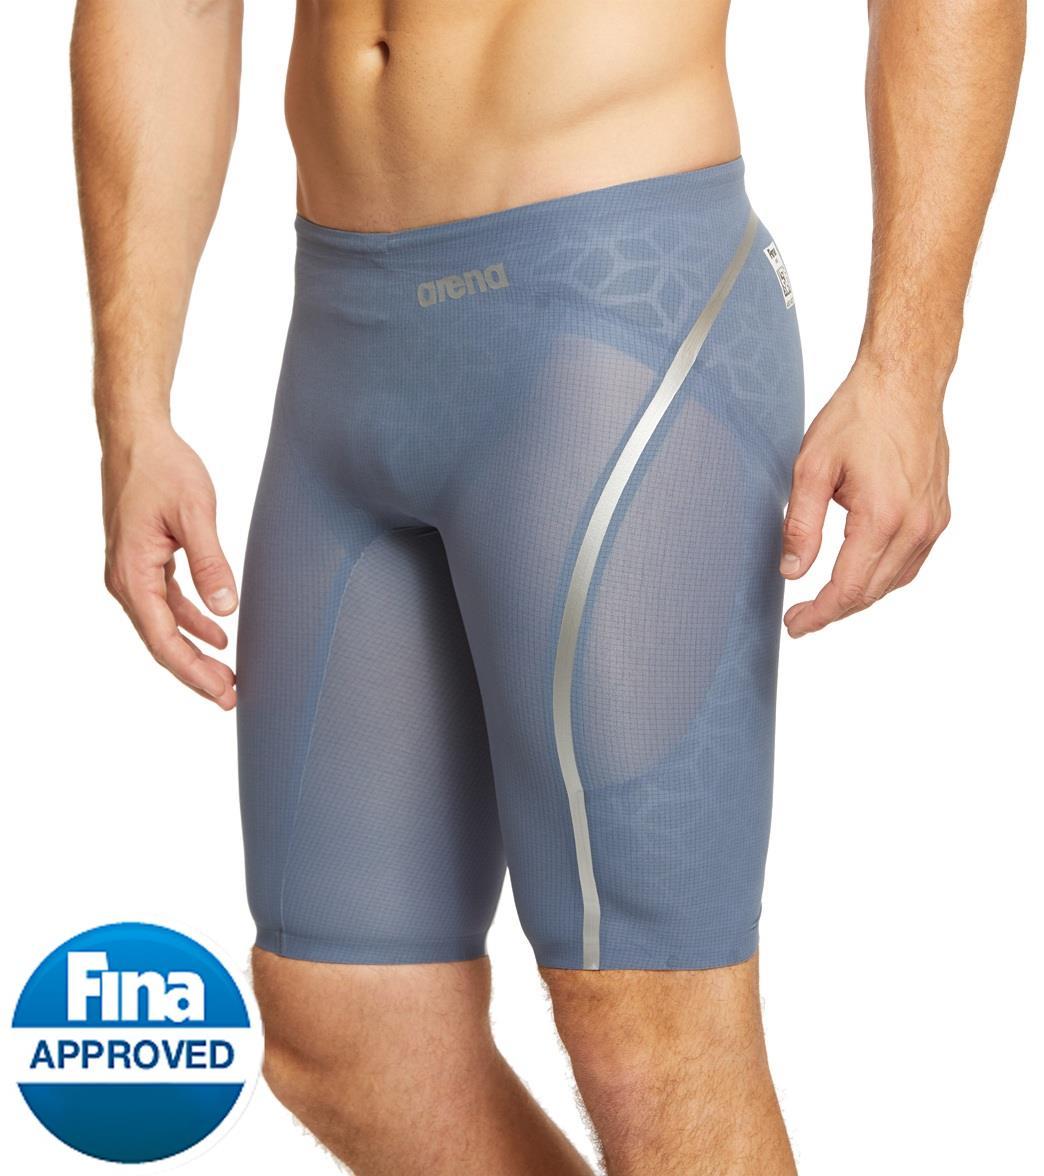 Arena Men's Powerskin Carbon Ultra Jammer Tech Suit Swimsuit